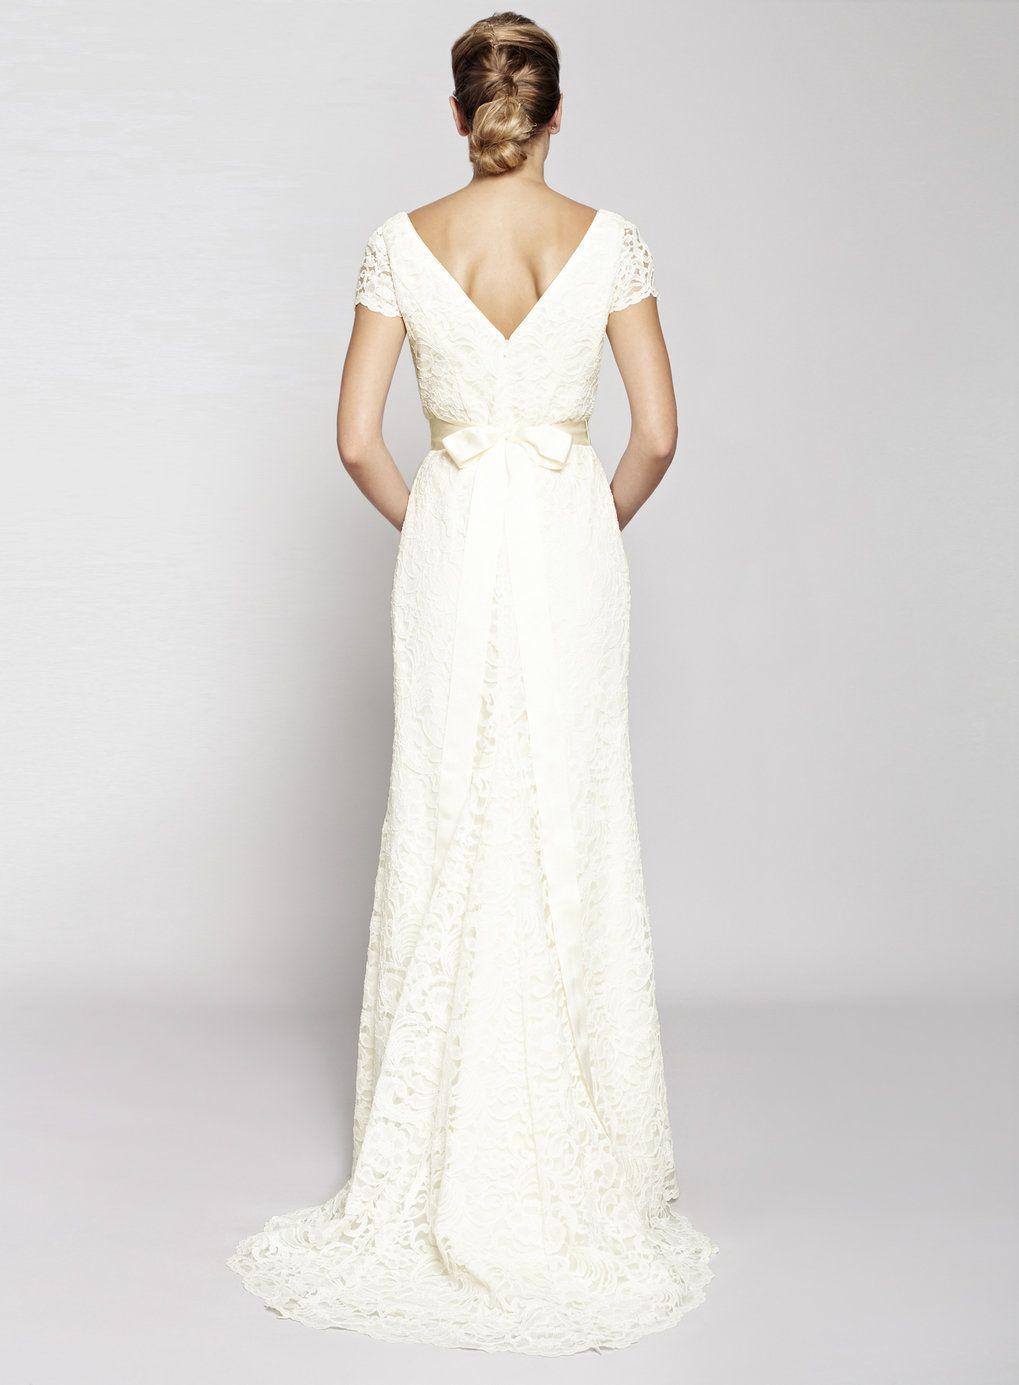 Ivory Sophie Wedding Dress Dresses Wedding Dresses Sheath Wedding Dress